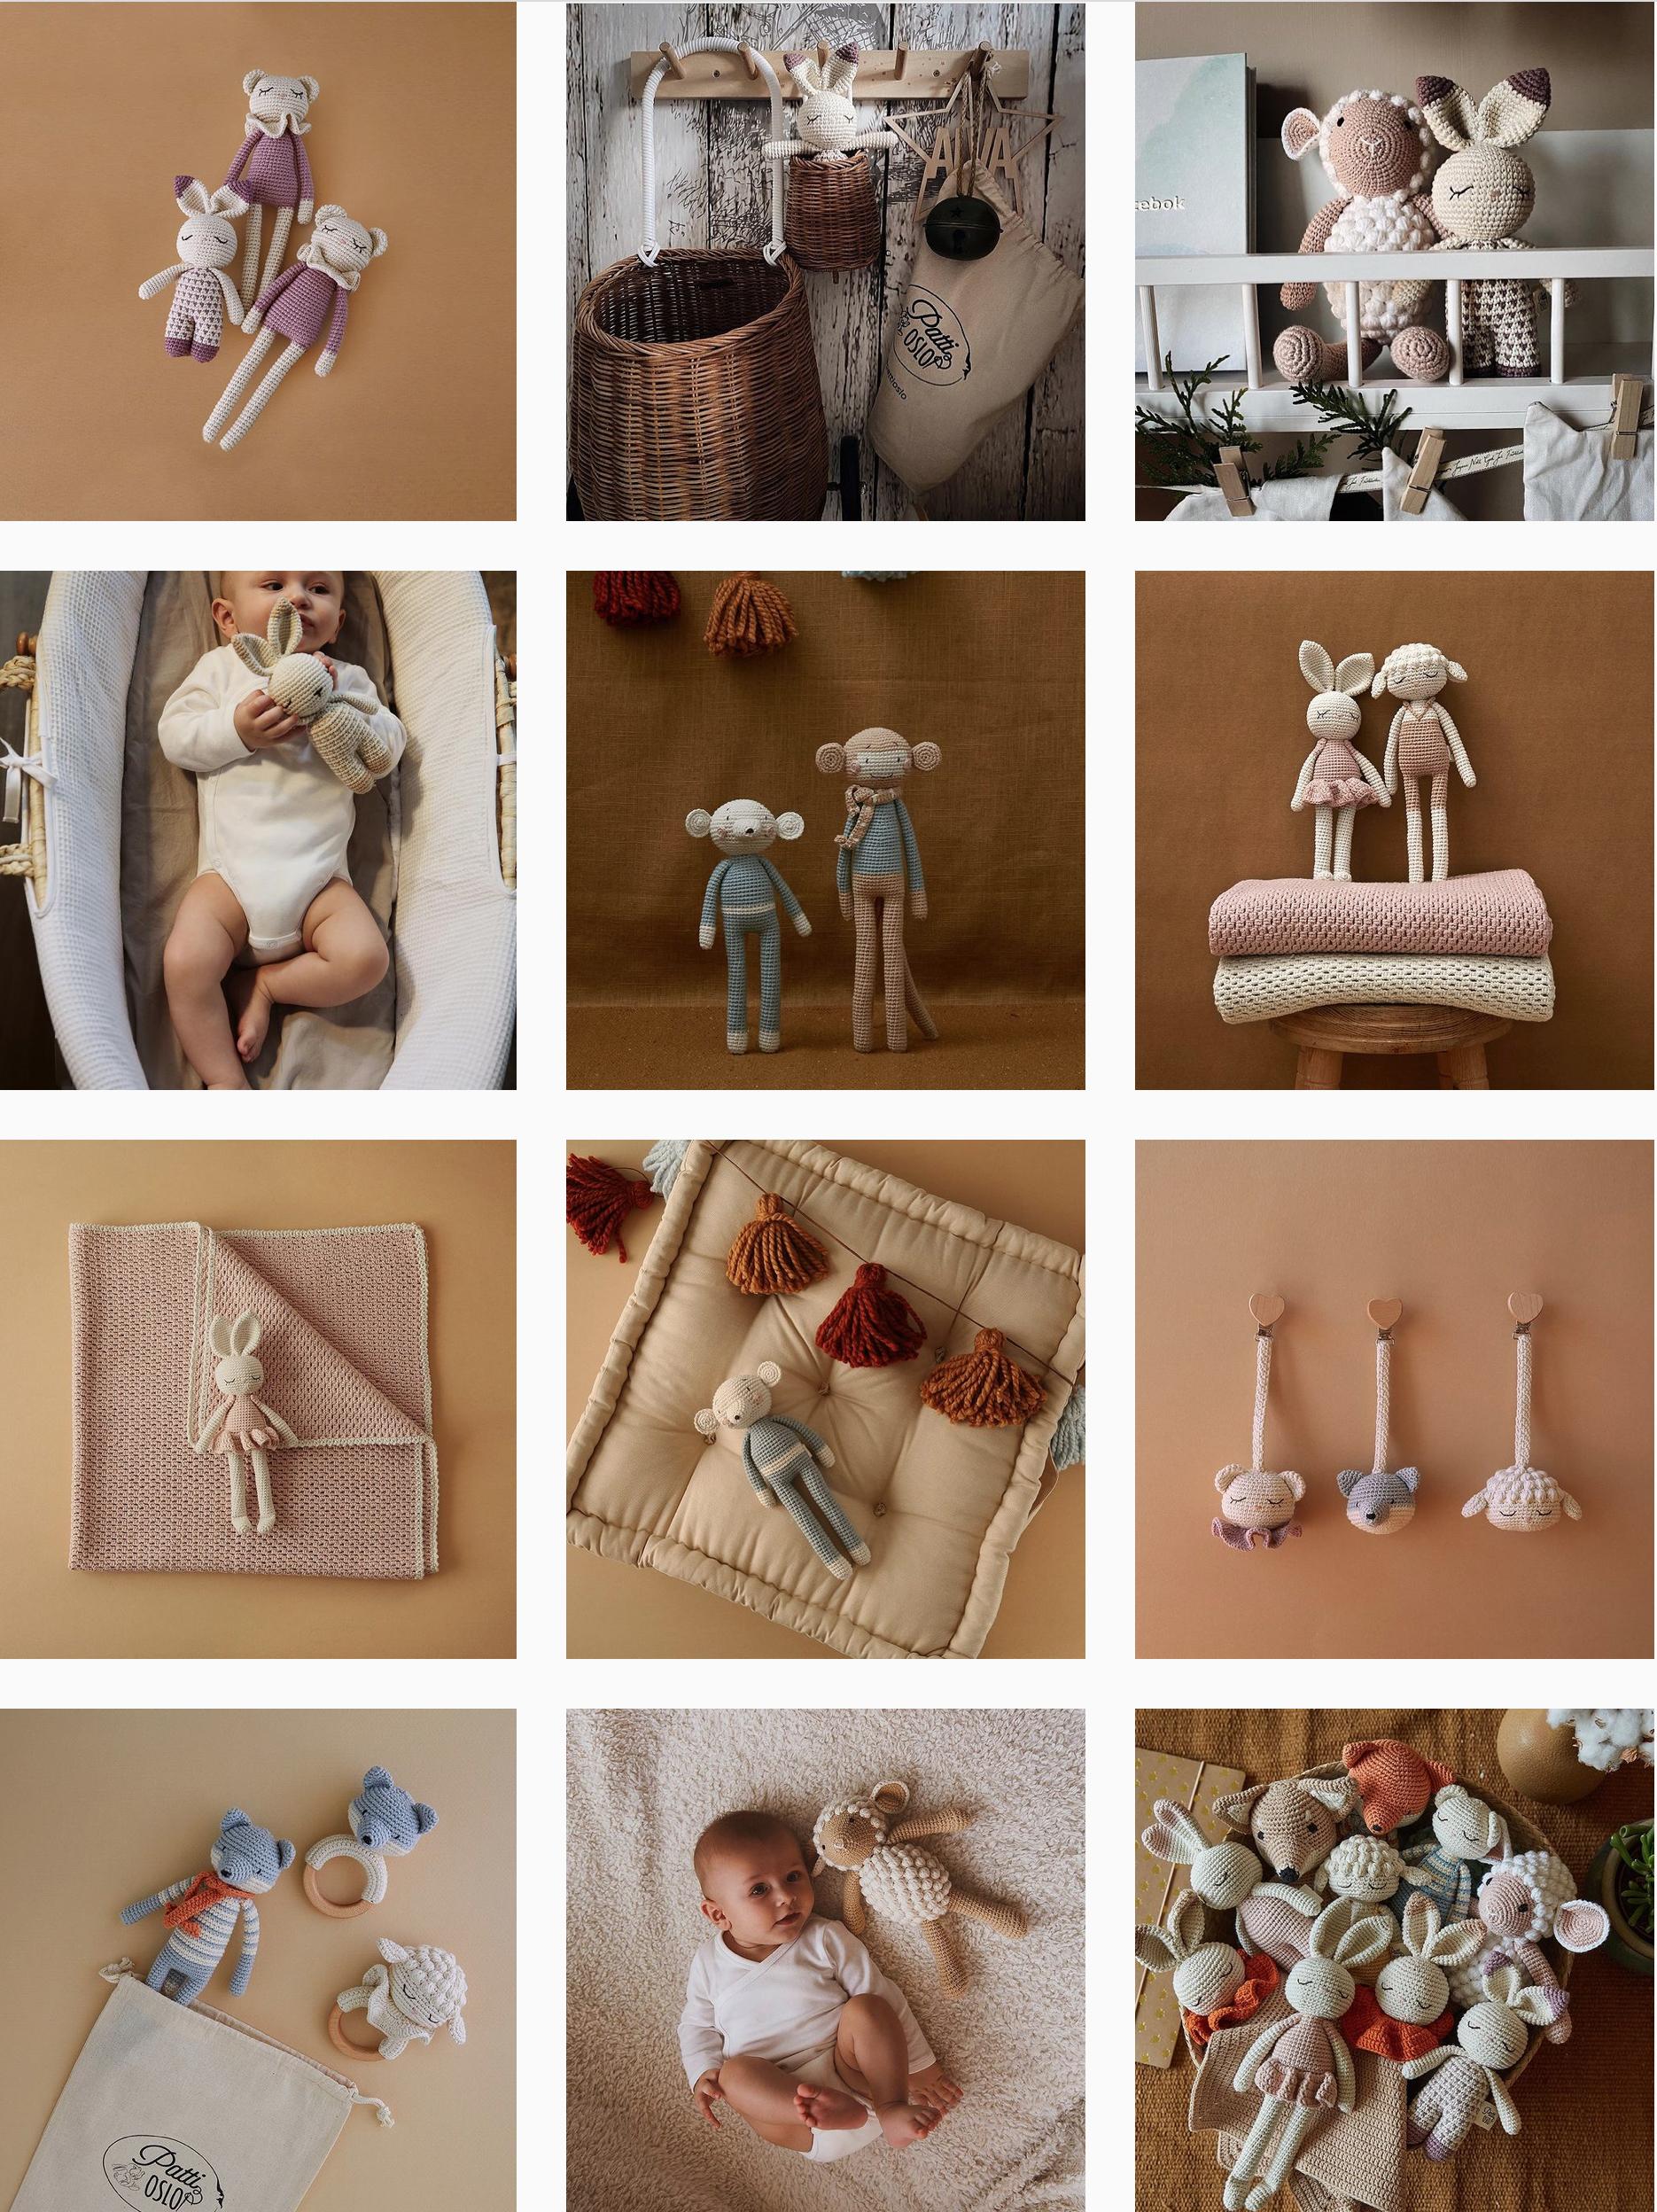 jouets et doudous en crochet Patti oslo